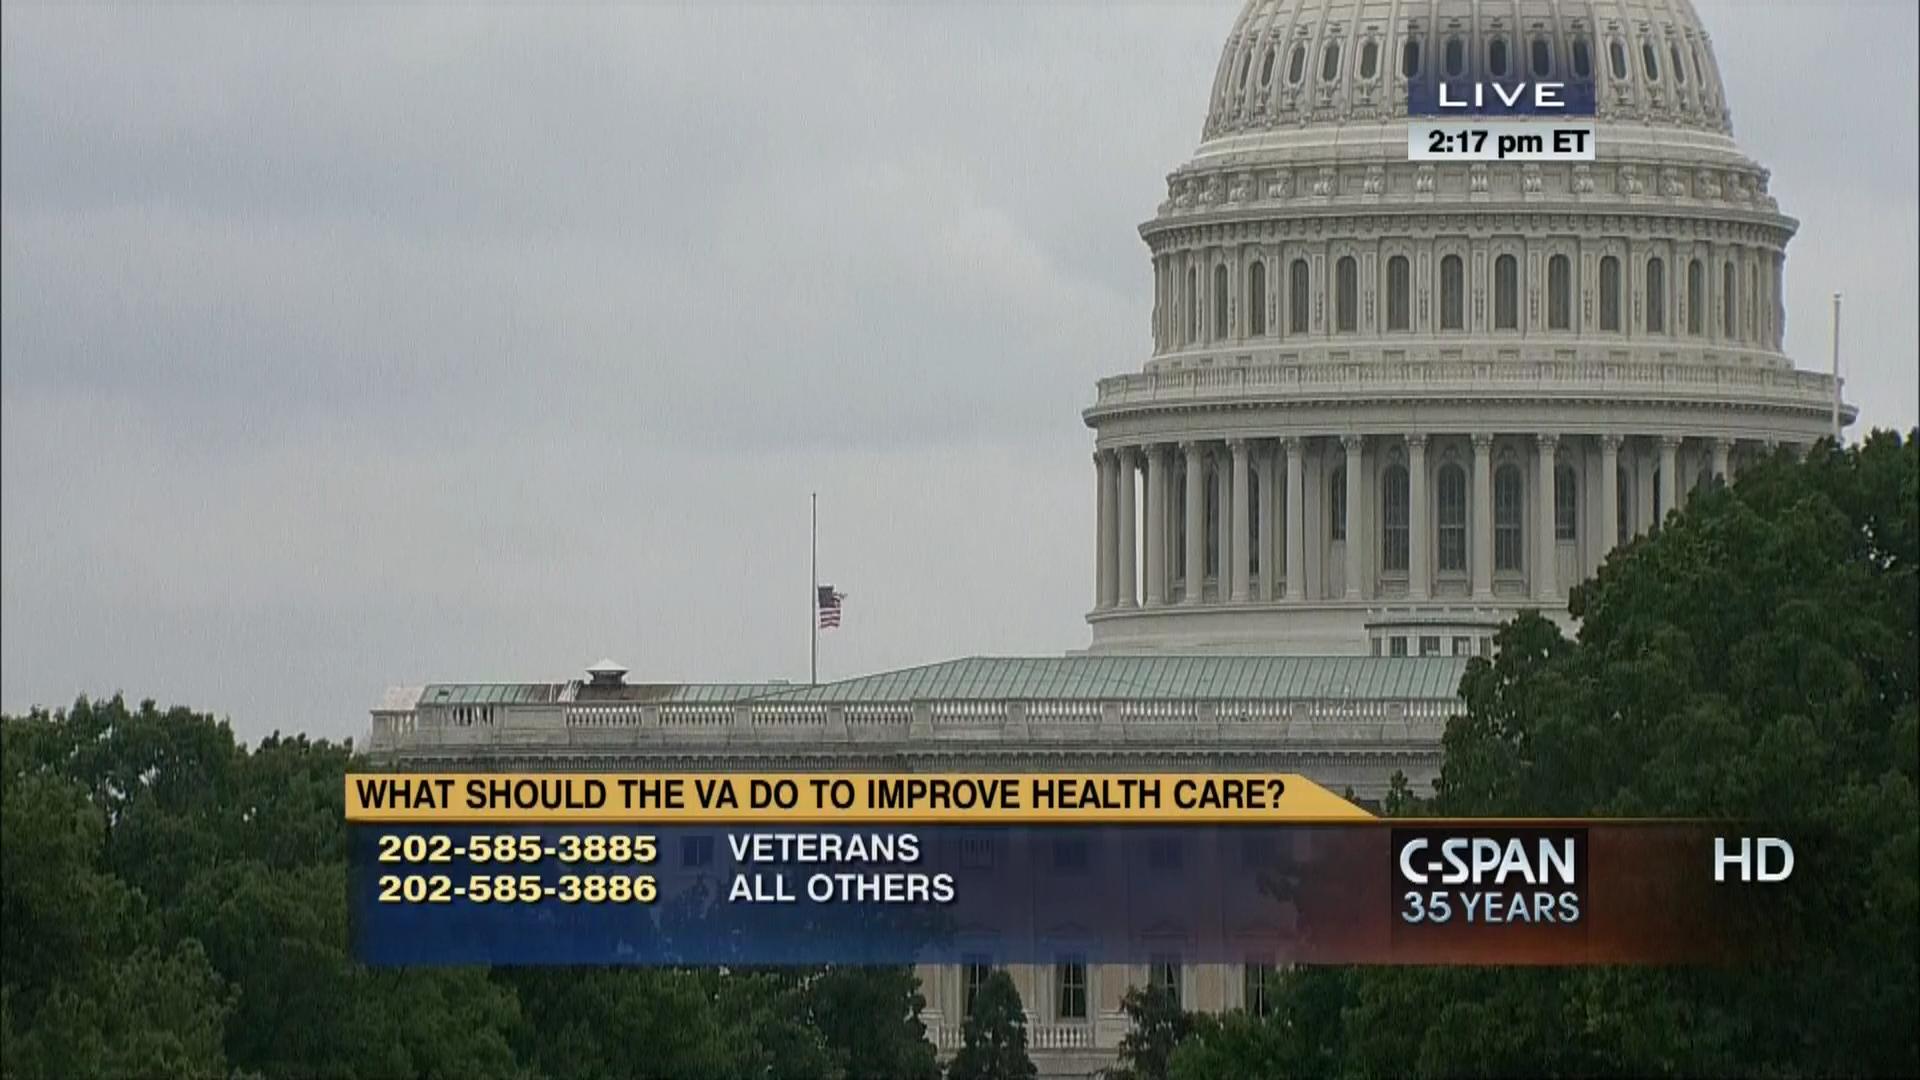 Open Phones on Veterans' Health Care